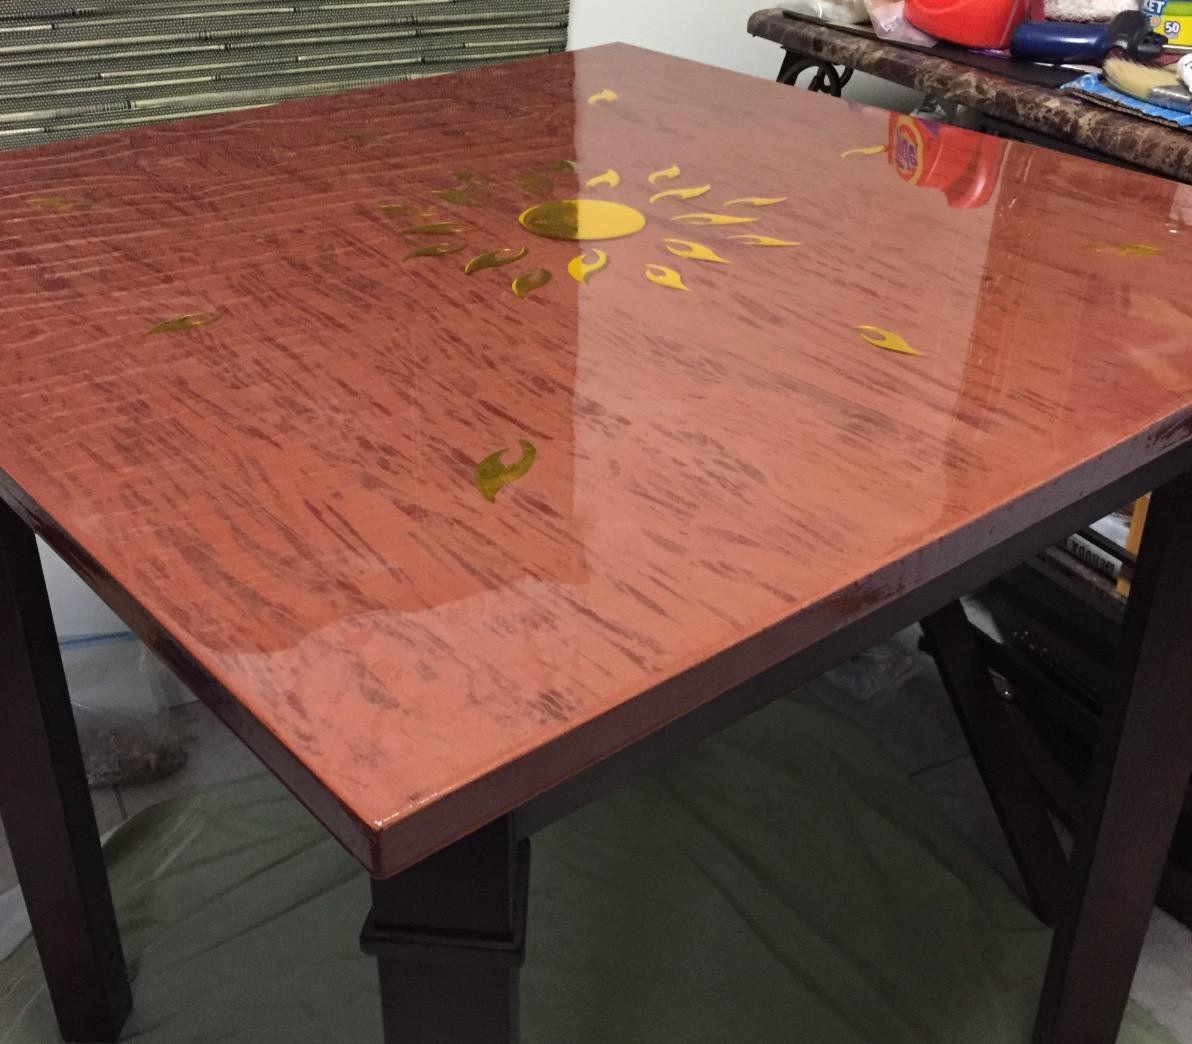 Kleer Kote Epoxy Resin Bar Table,counter top Coating Wood High-Gloss UV Resist H